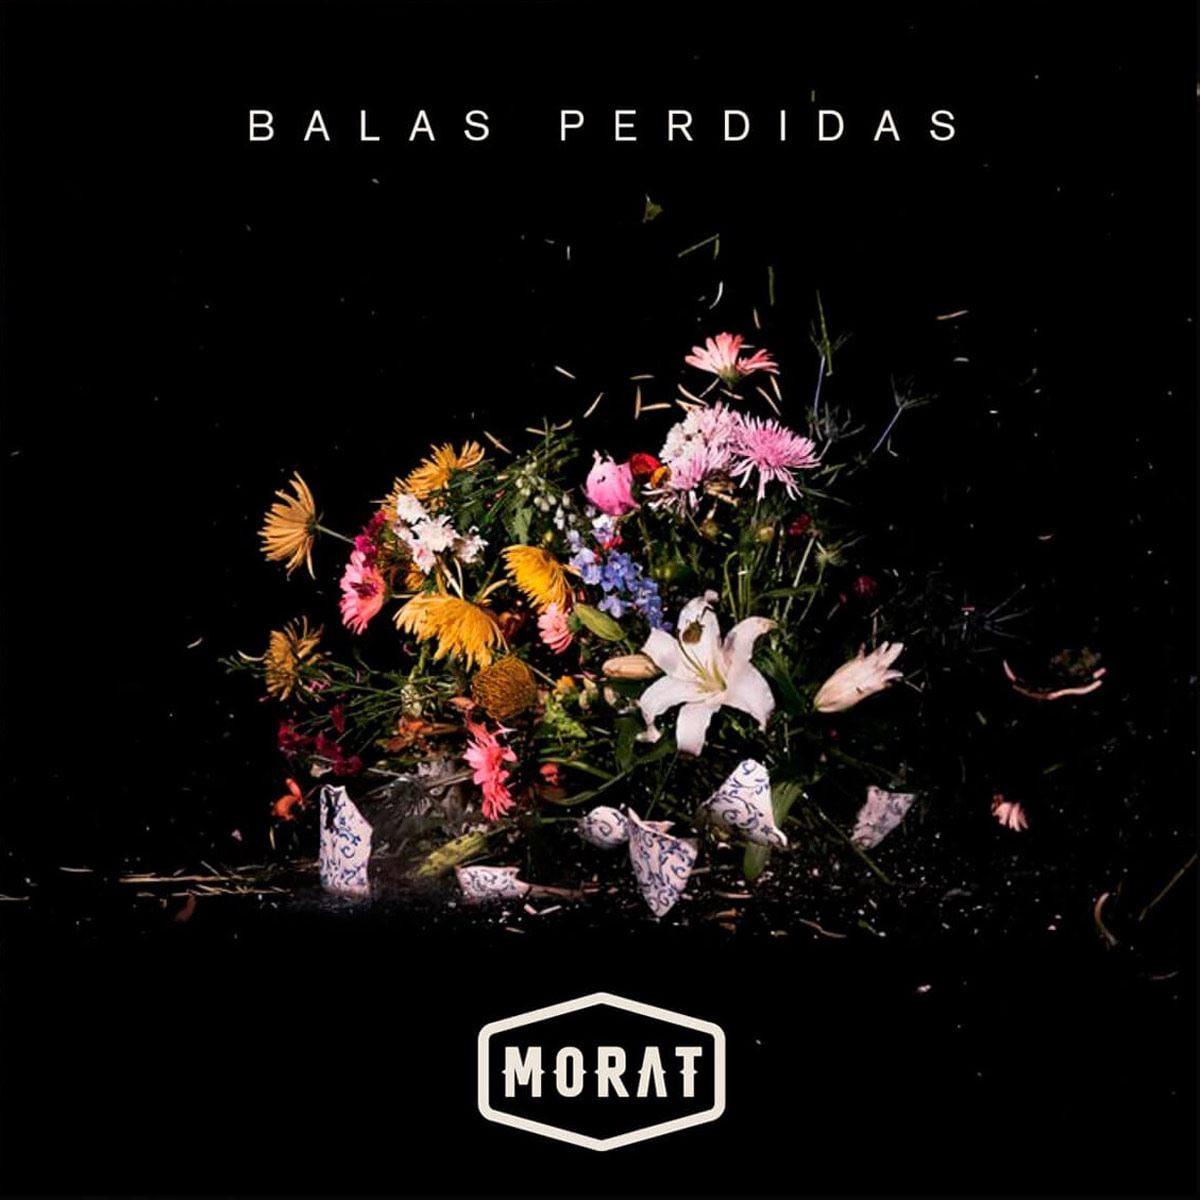 CD Morat- Balas Perdidas